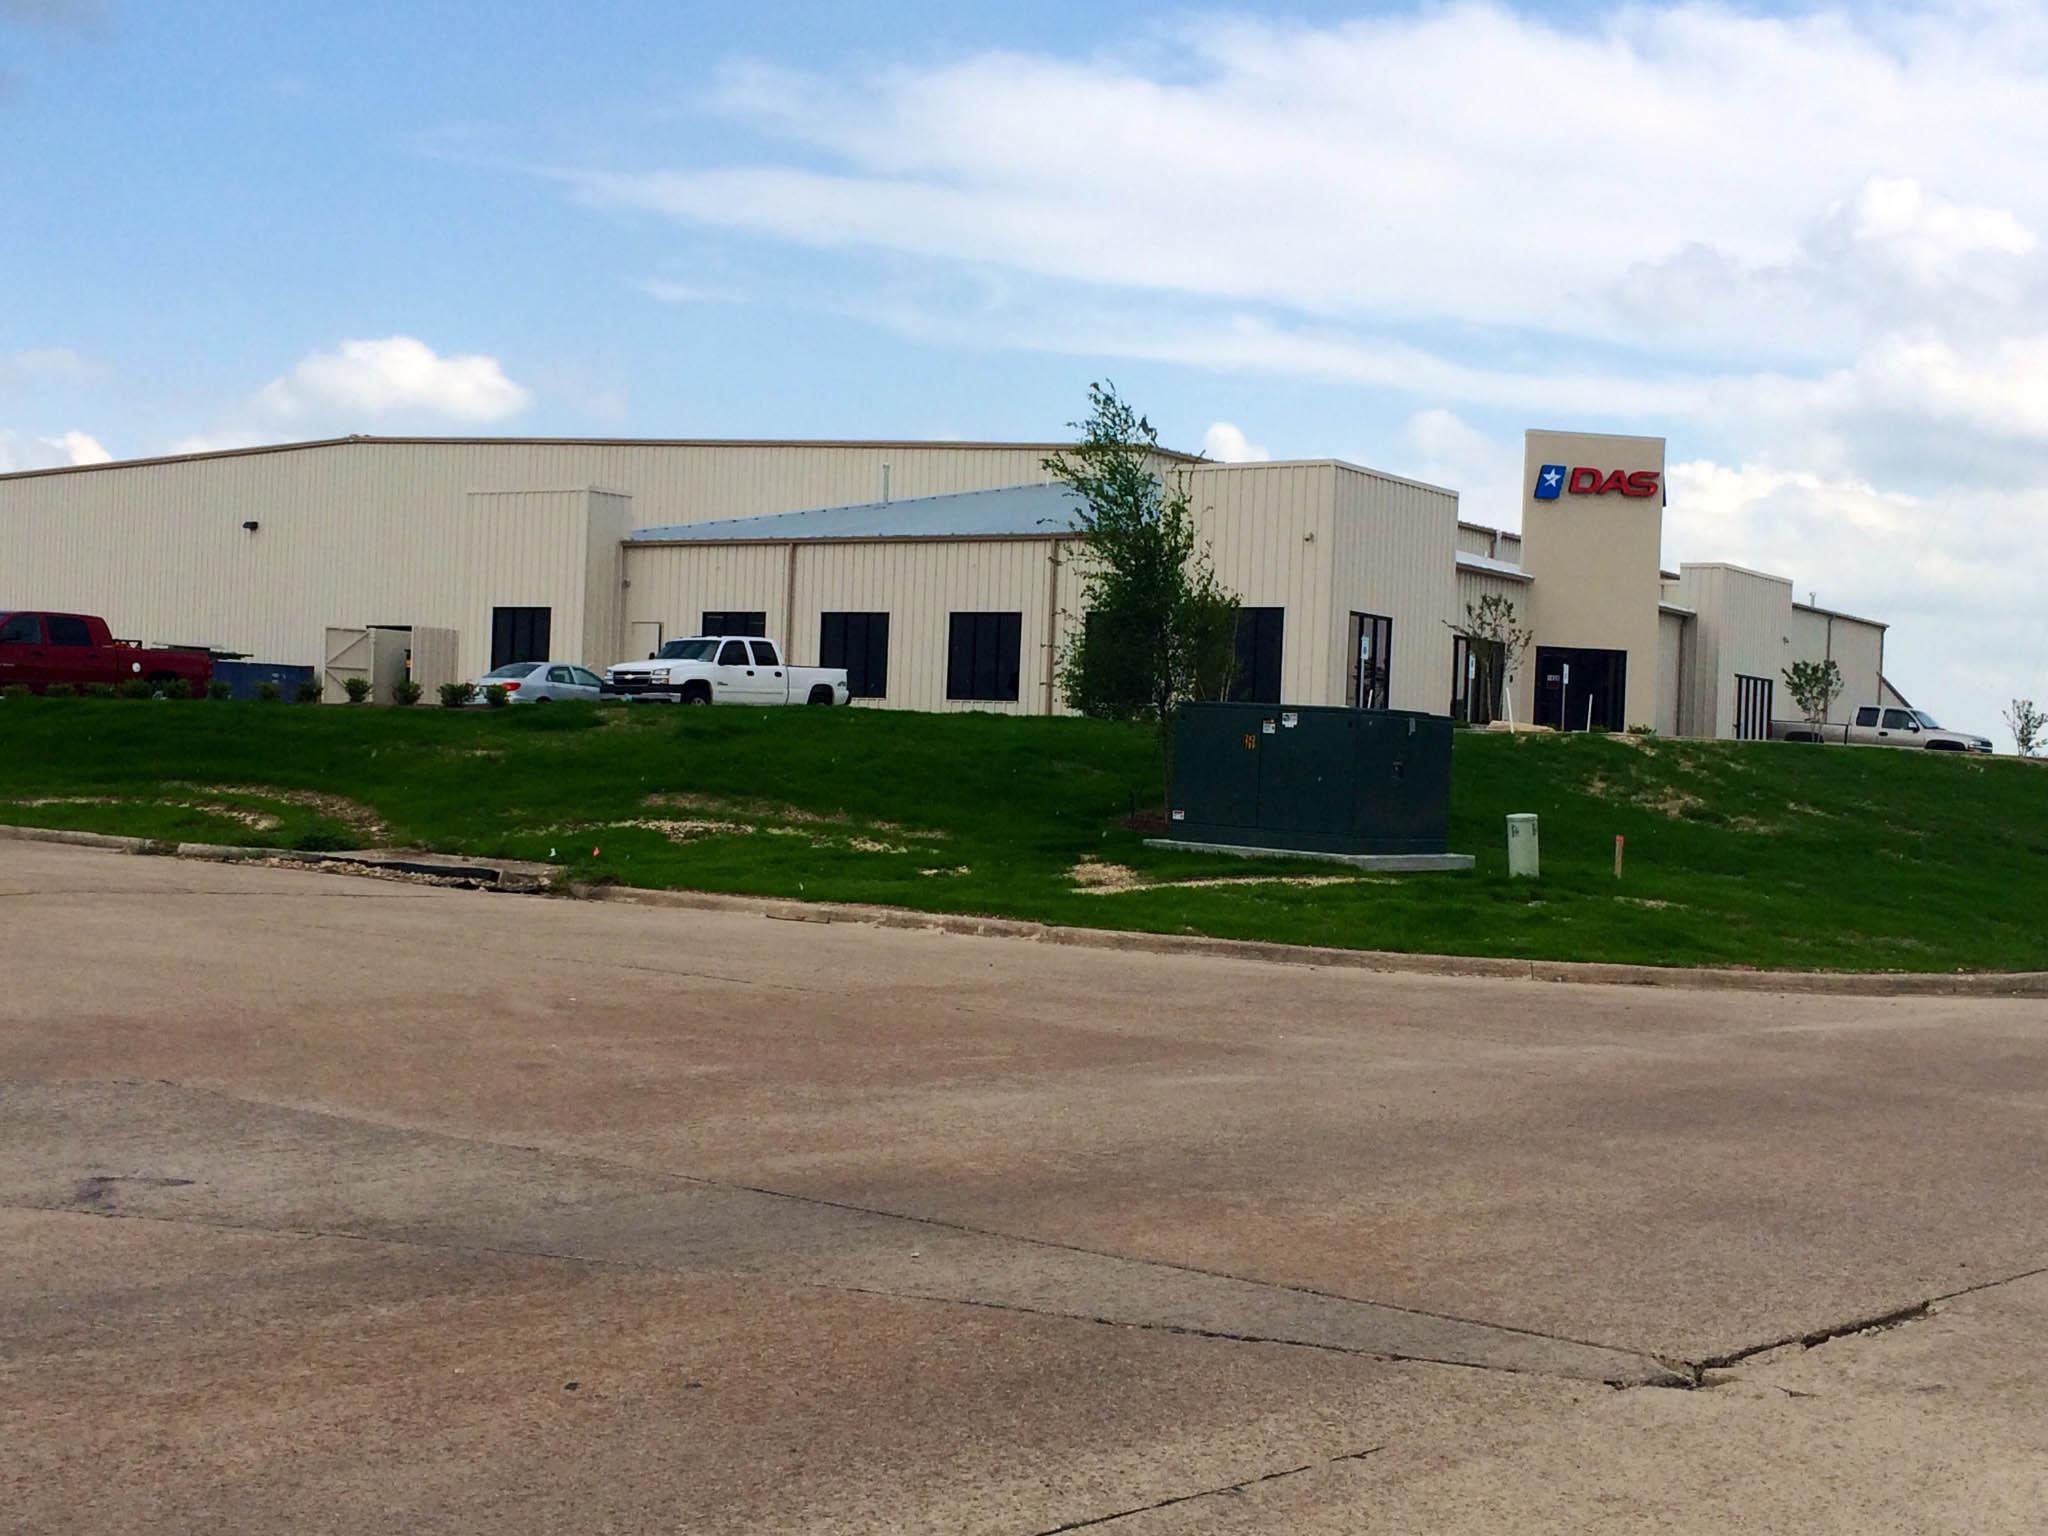 Dallas Aeronautics Industrial Construction Exterior long view